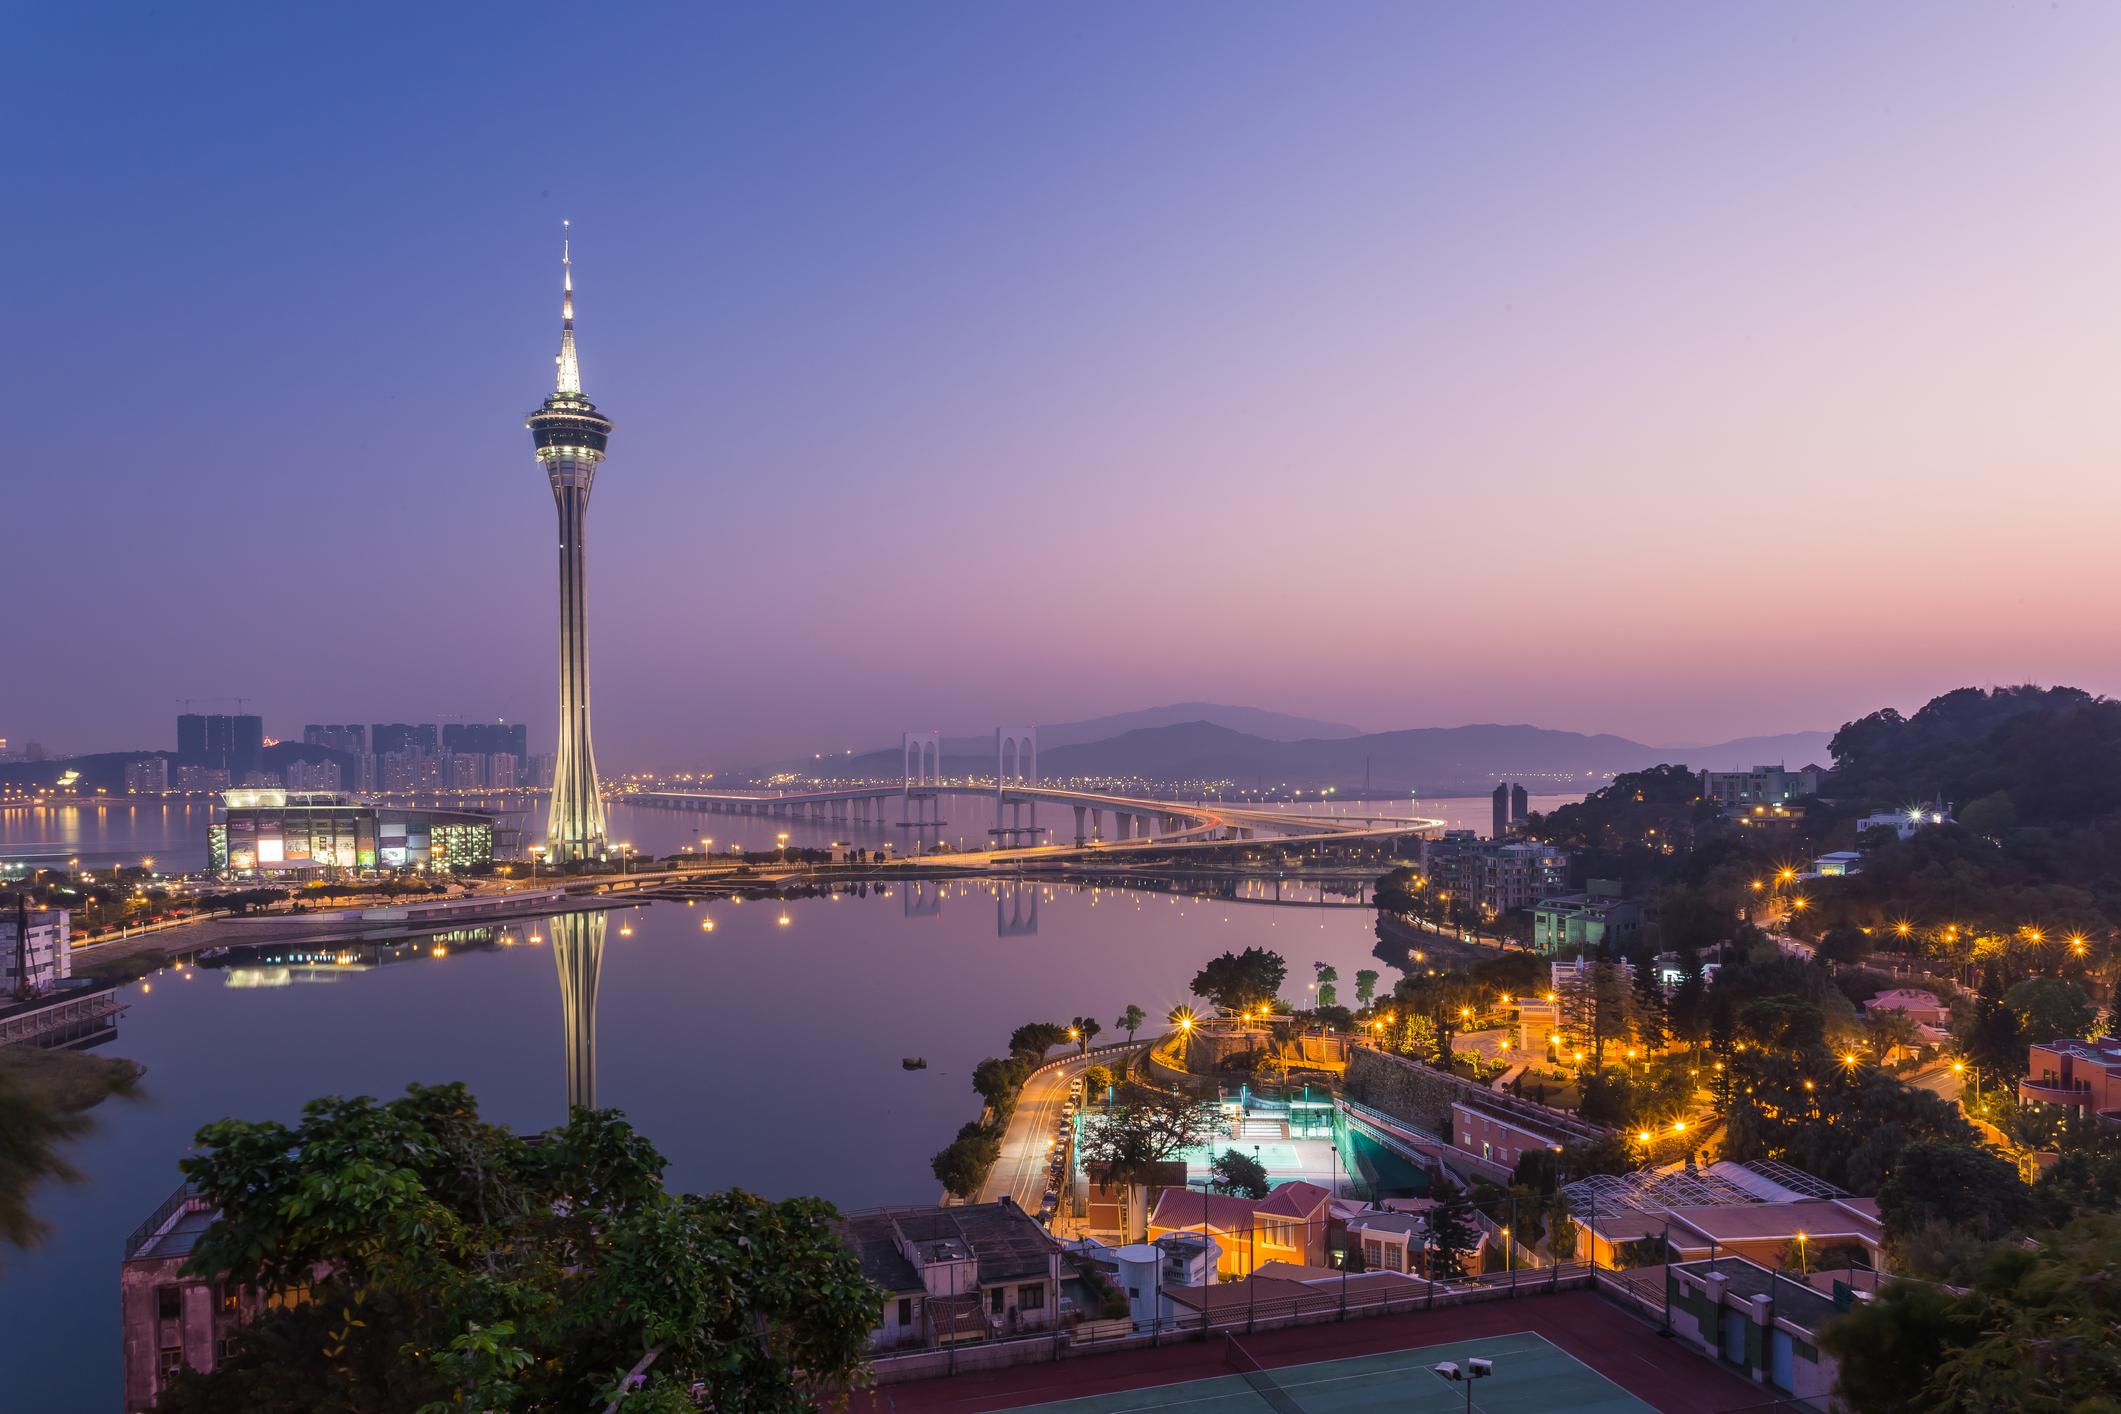 Macau city skyline at night